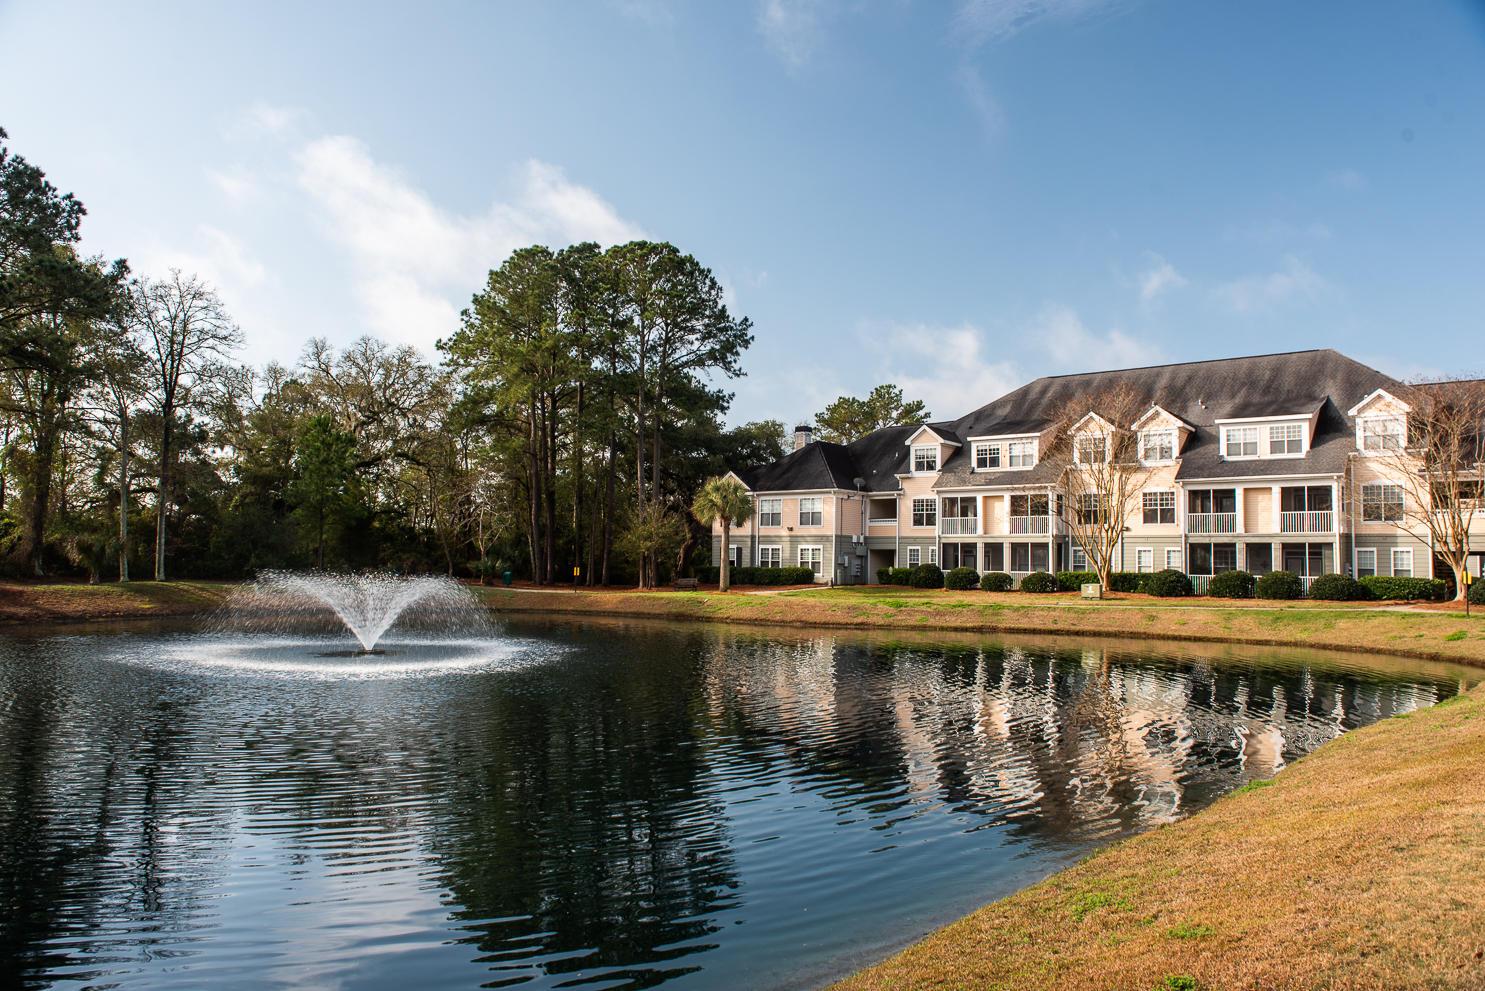 Daniel Landing Condos Homes For Sale - 130 River Landing, Charleston, SC - 6